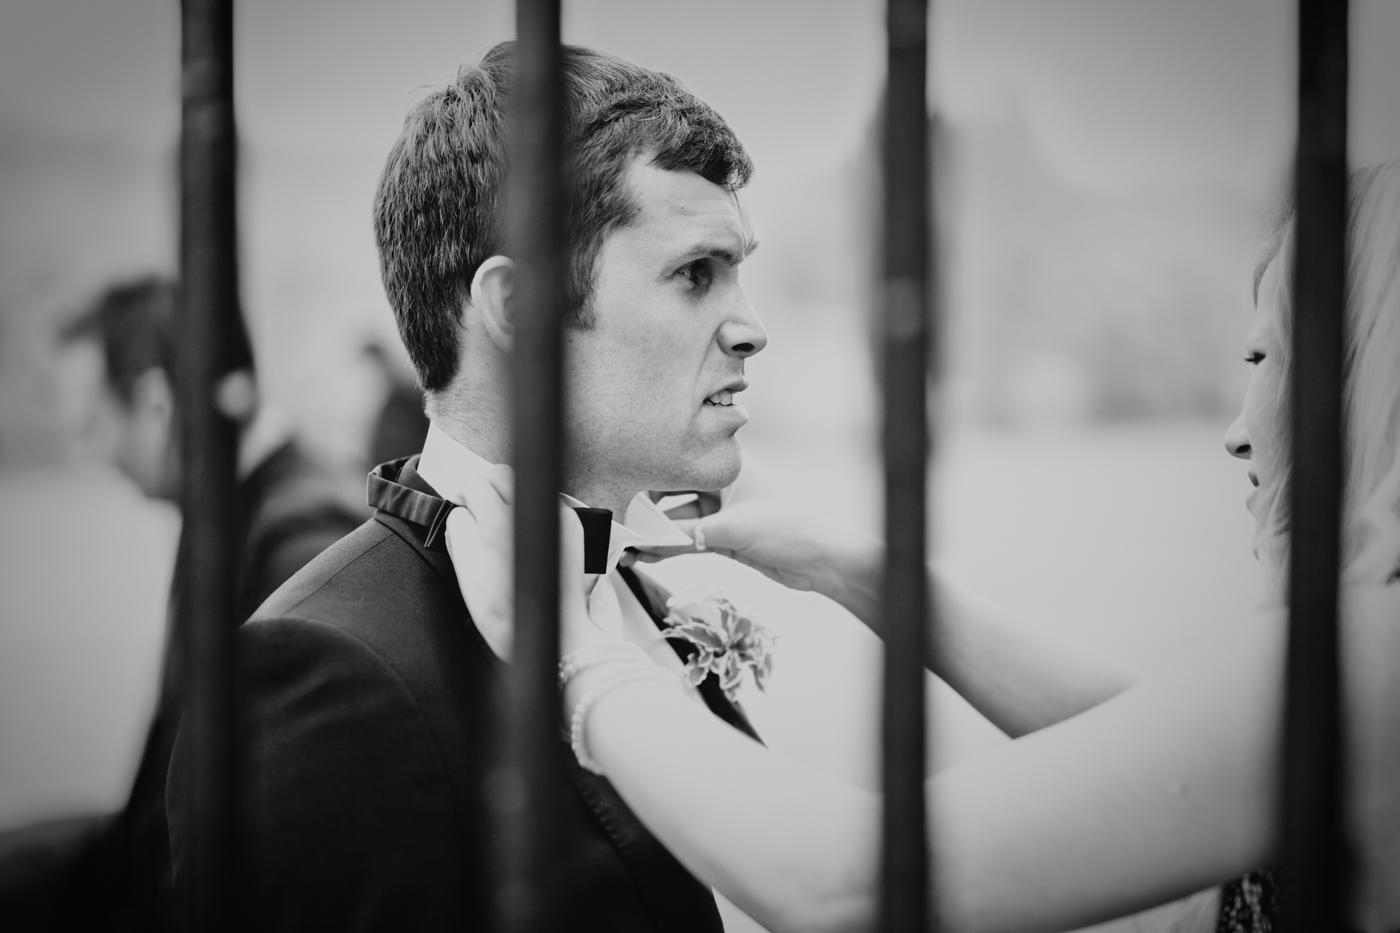 028 - Abi and Chris at Kedleston Hall - Wedding Photography by Mark Pugh www.markpugh.com - 0083.JPG